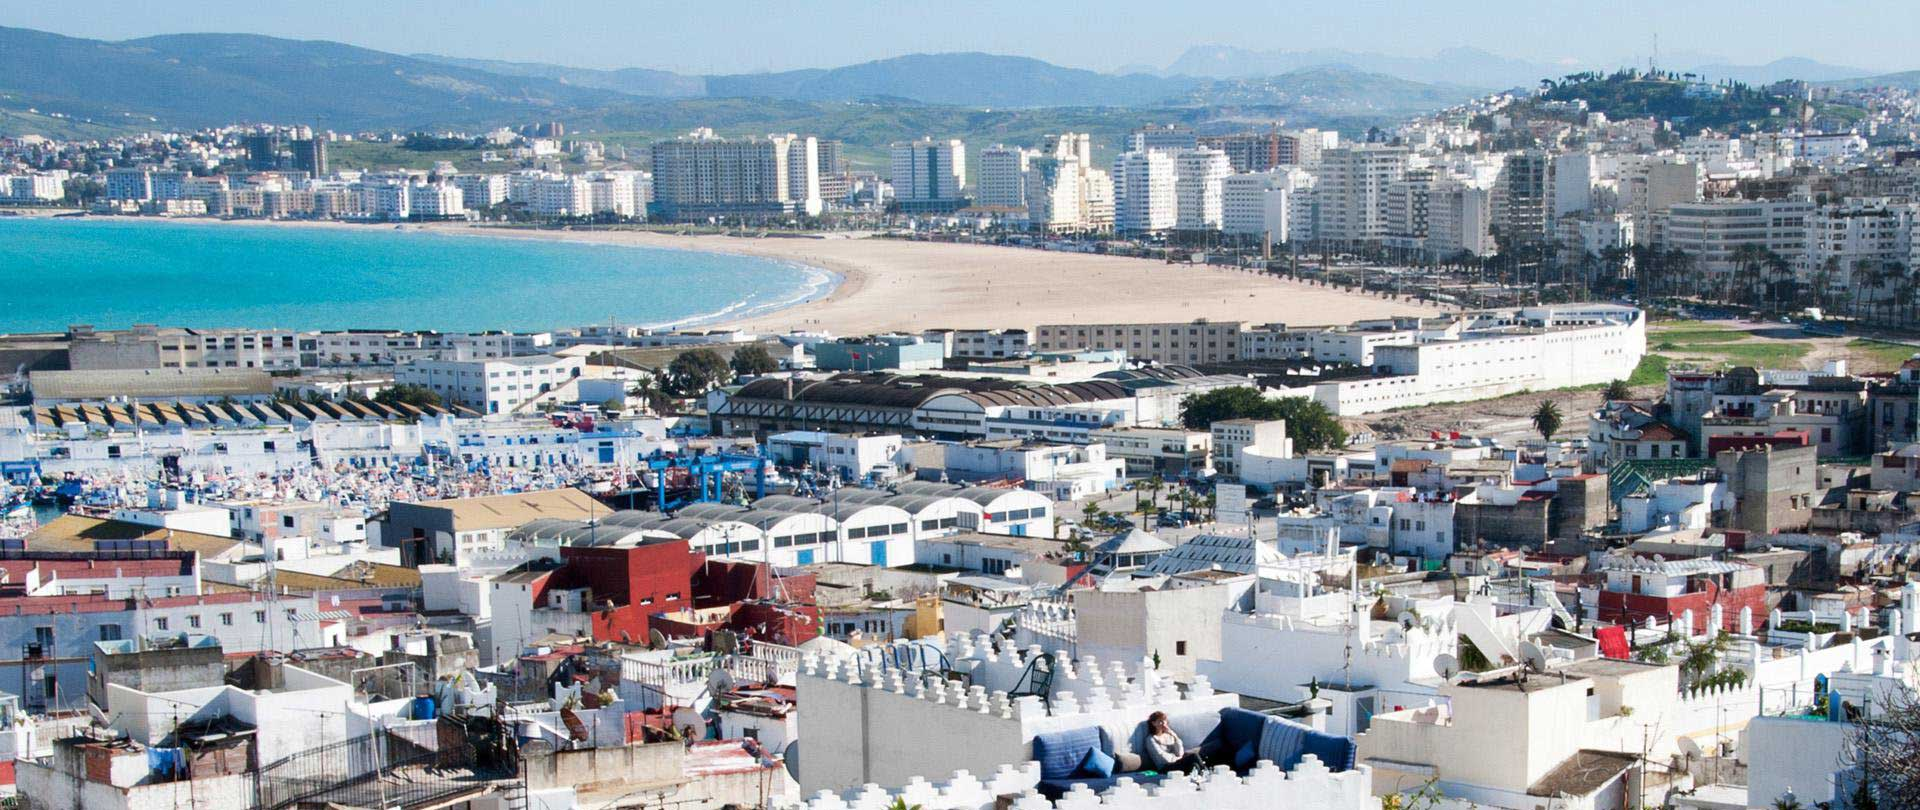 5 days tour from Tanger to Marrakech via Sahara